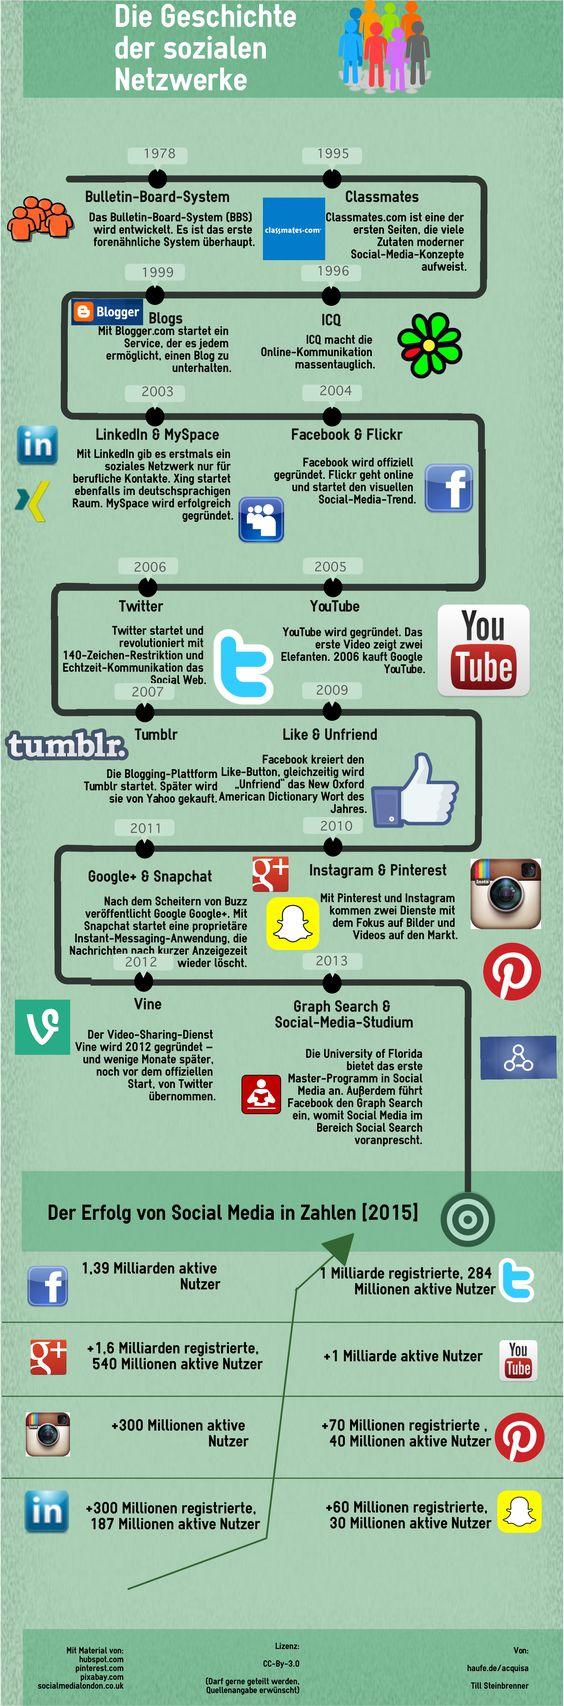 Die Social-Media-Geschichte: Vom Bulletin-Board-System 1978 bis Snapchat & Vine   Kroker's Look @ IT  http://blog.wiwo.de/look-at-it/2015/11/16/die-social-media-geschichte-vom-bulletin-board-system-1978-bis-snapchat-vine/